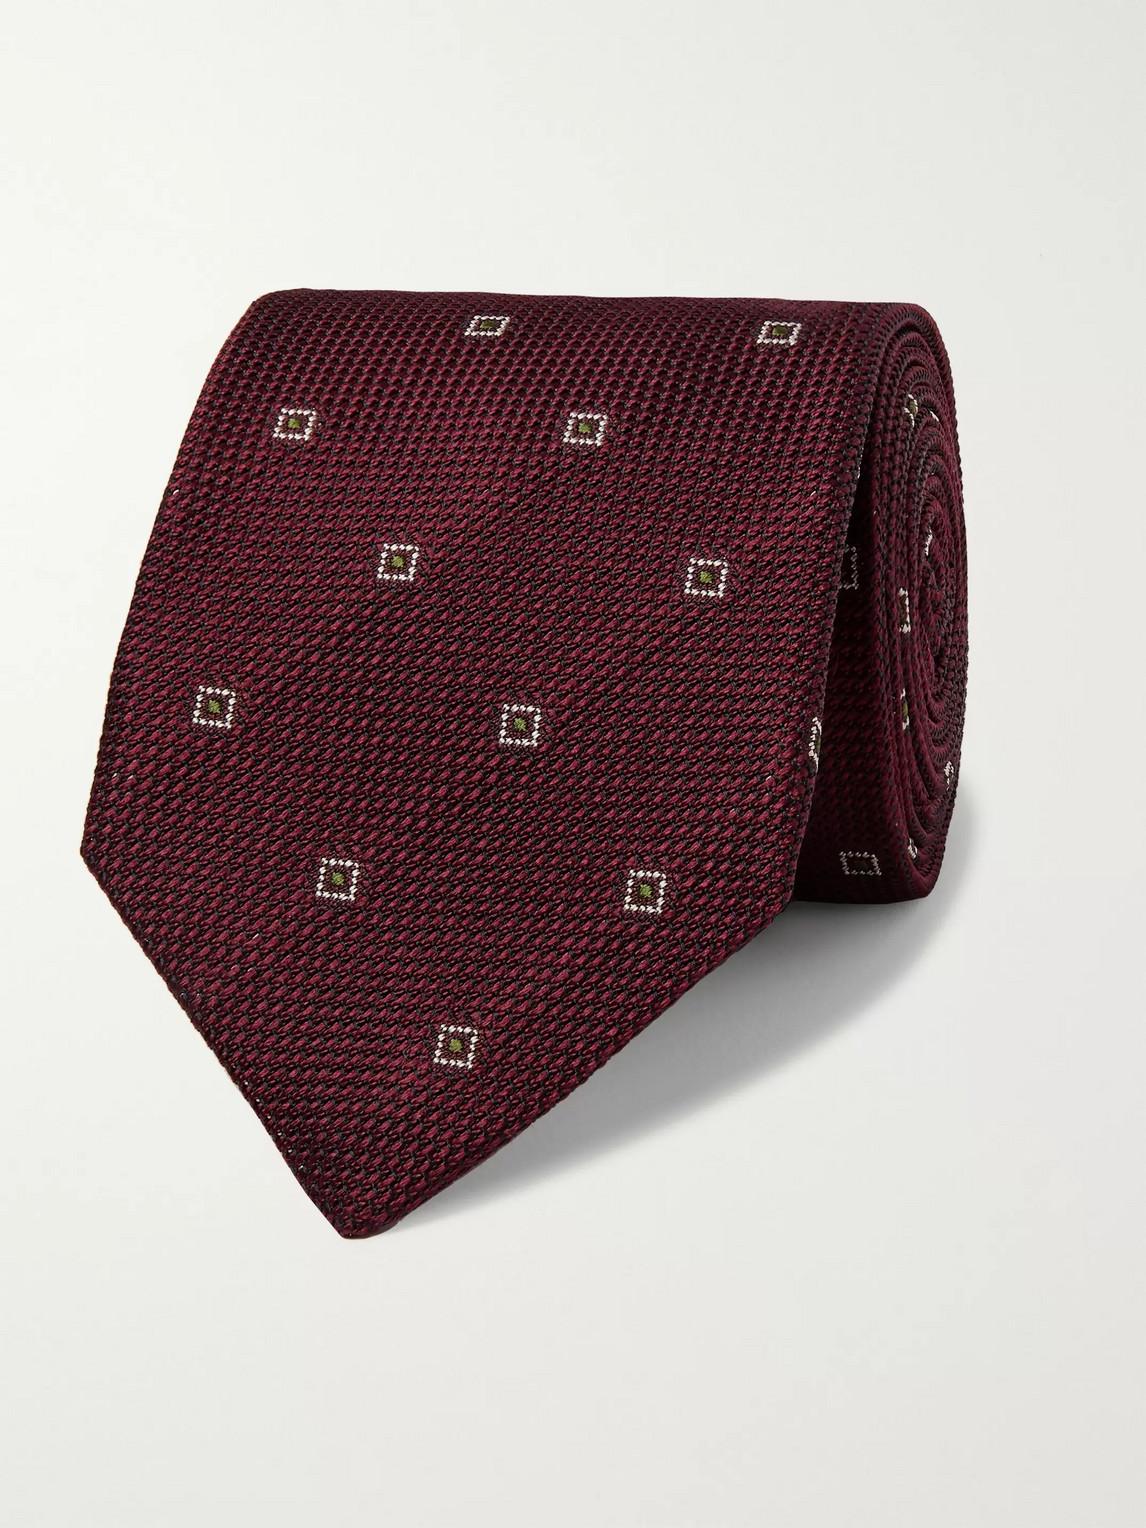 Kingsman Drake's 8cm Embroidered Silk-jacquard Tie In Burgundy